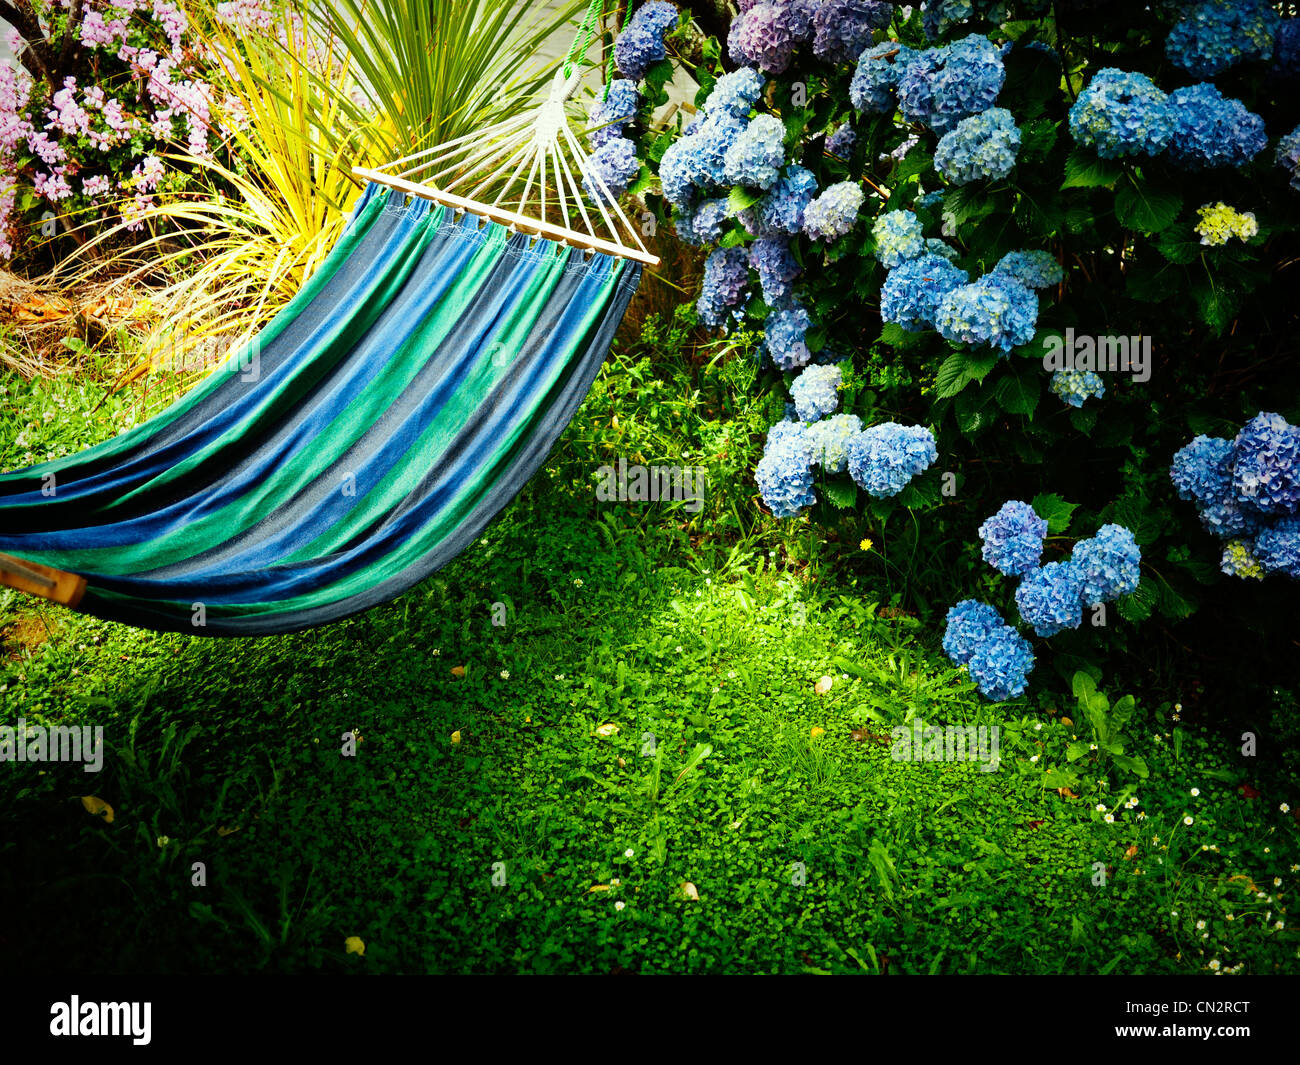 Summer in New Zealand: blue hammock, lawn and hydrangea. - Stock Image